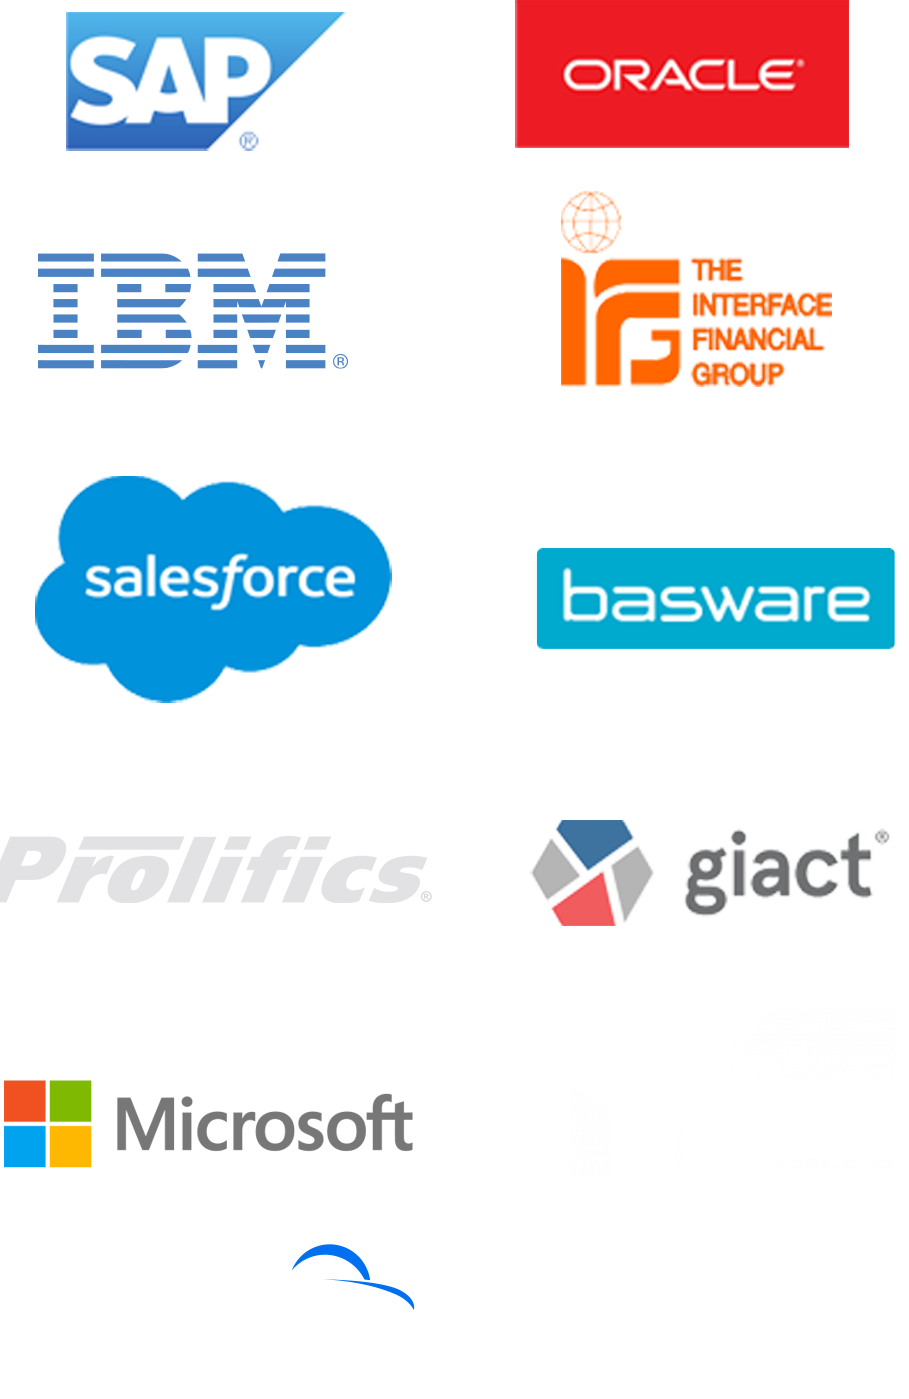 https://www.apexanalytix.com/sites/default/files/revslider/image/apex-partner-logos-mobile_1.png